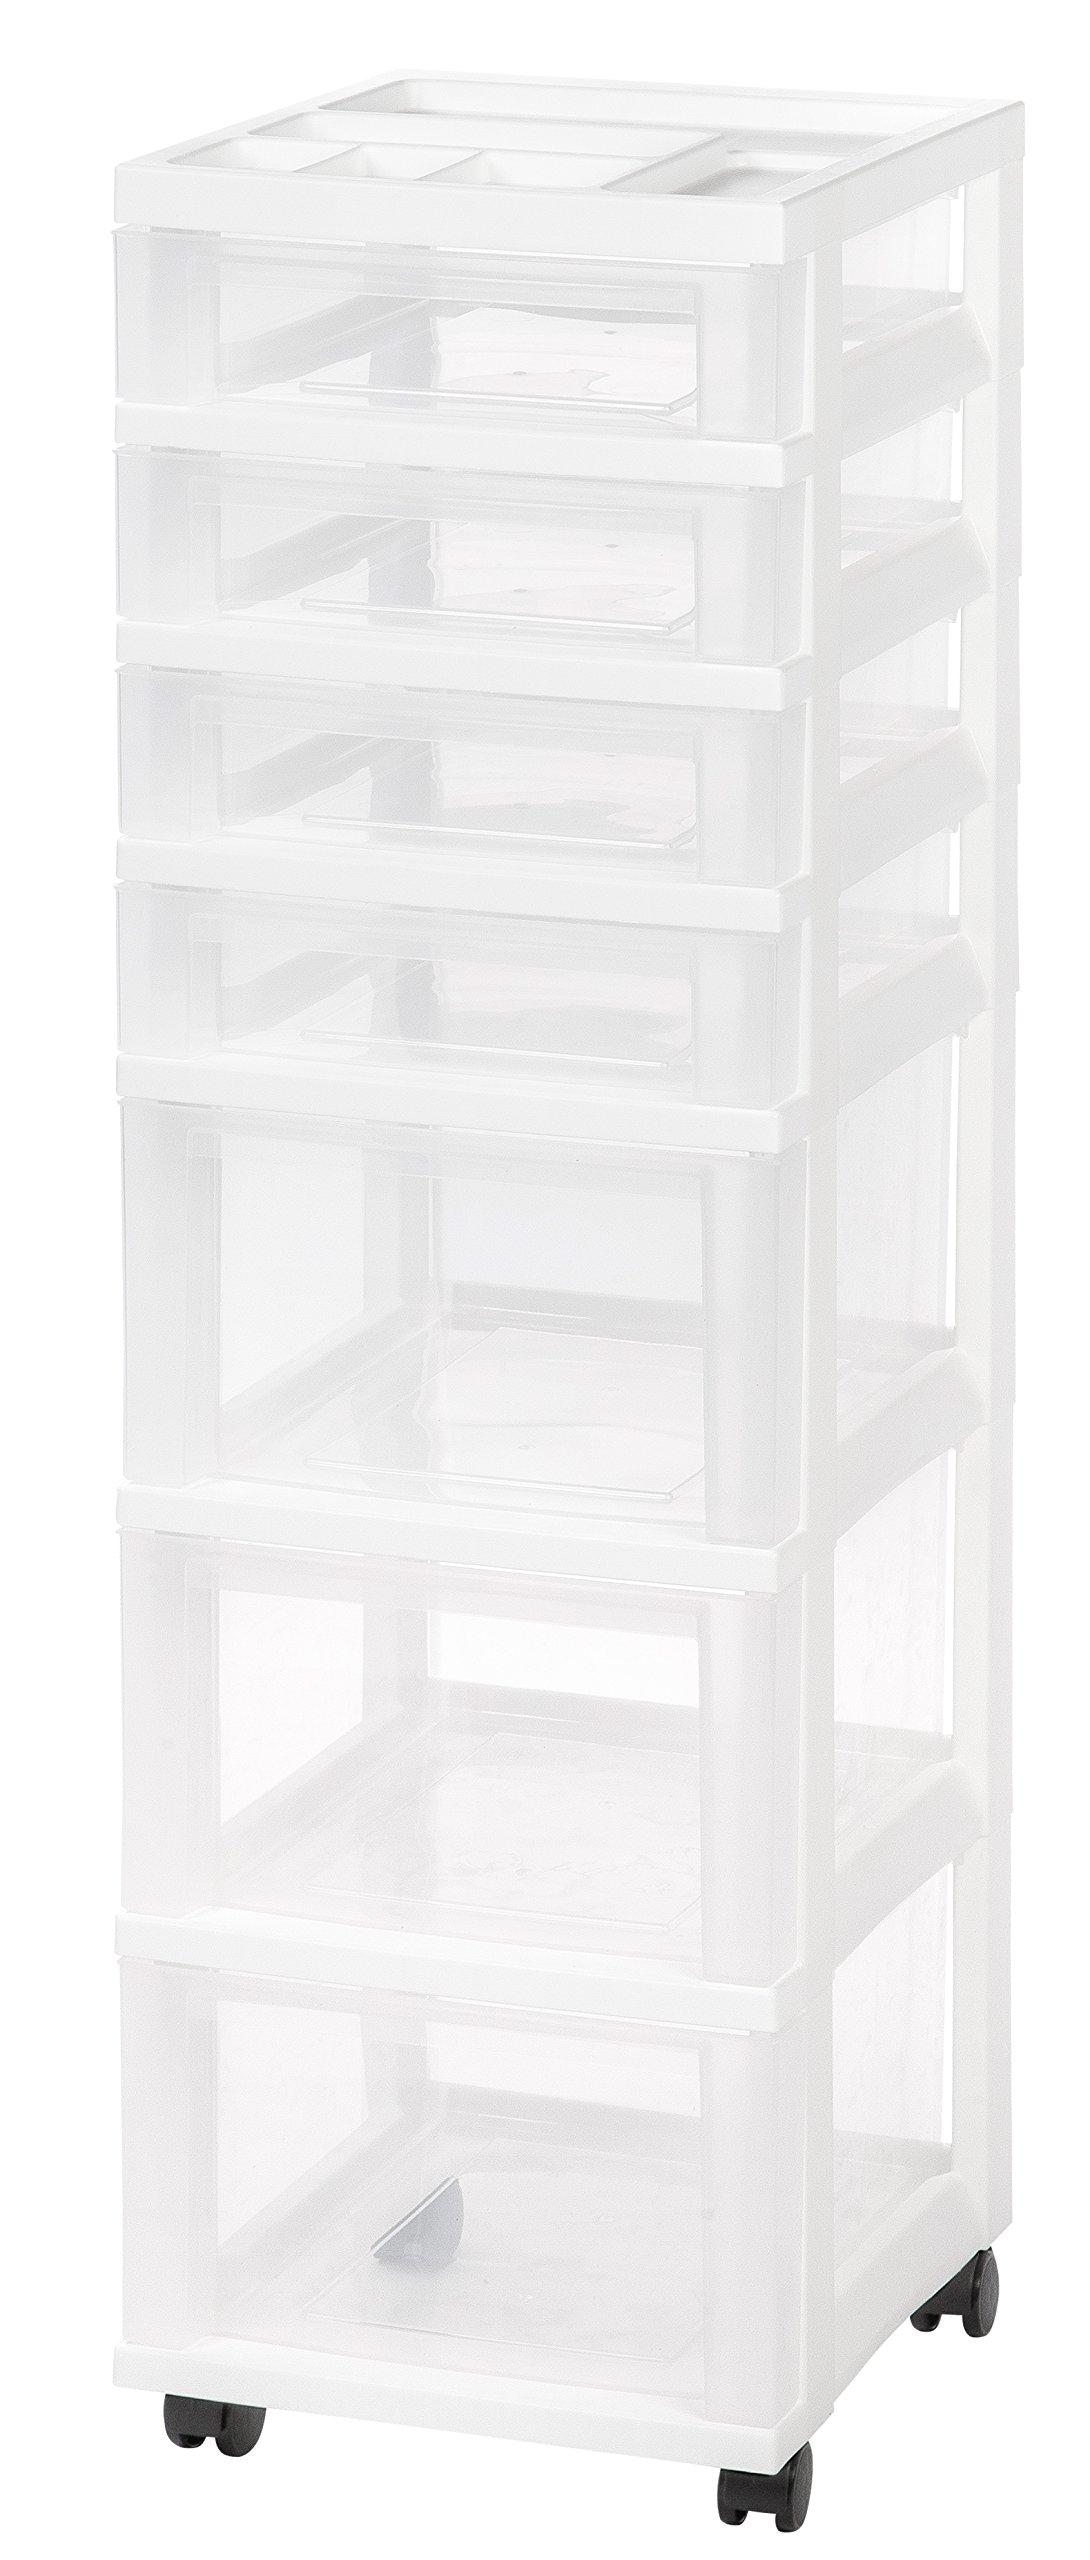 IRIS Medium 7-Drawer Storage Cart W/Organizer, White by IRIS USA, Inc.